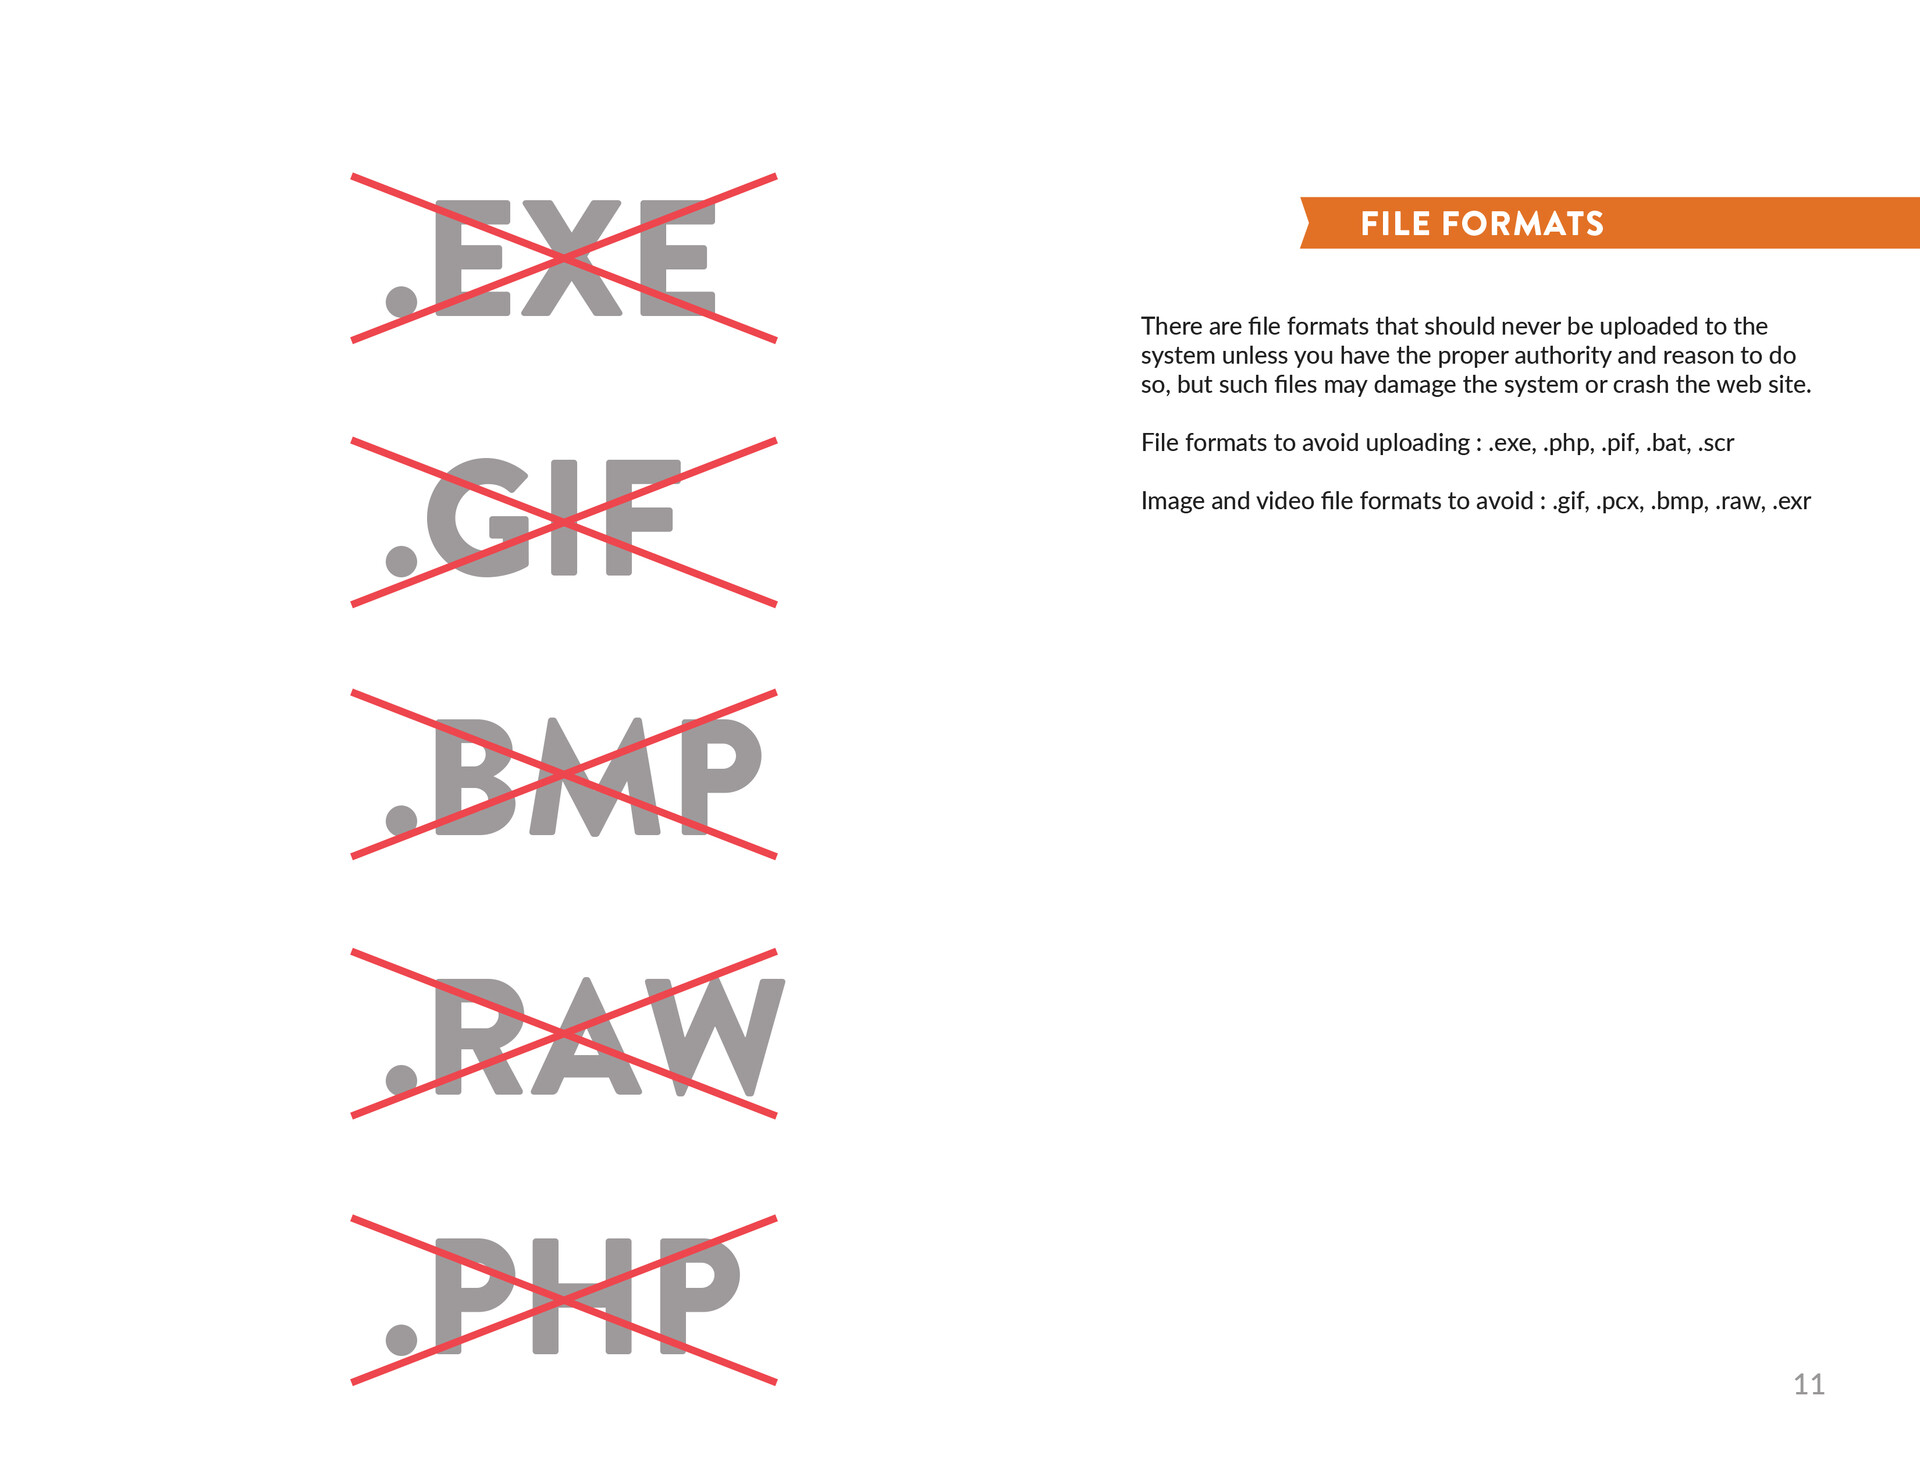 Kyle miller iusd intranet branding manual 2019 11